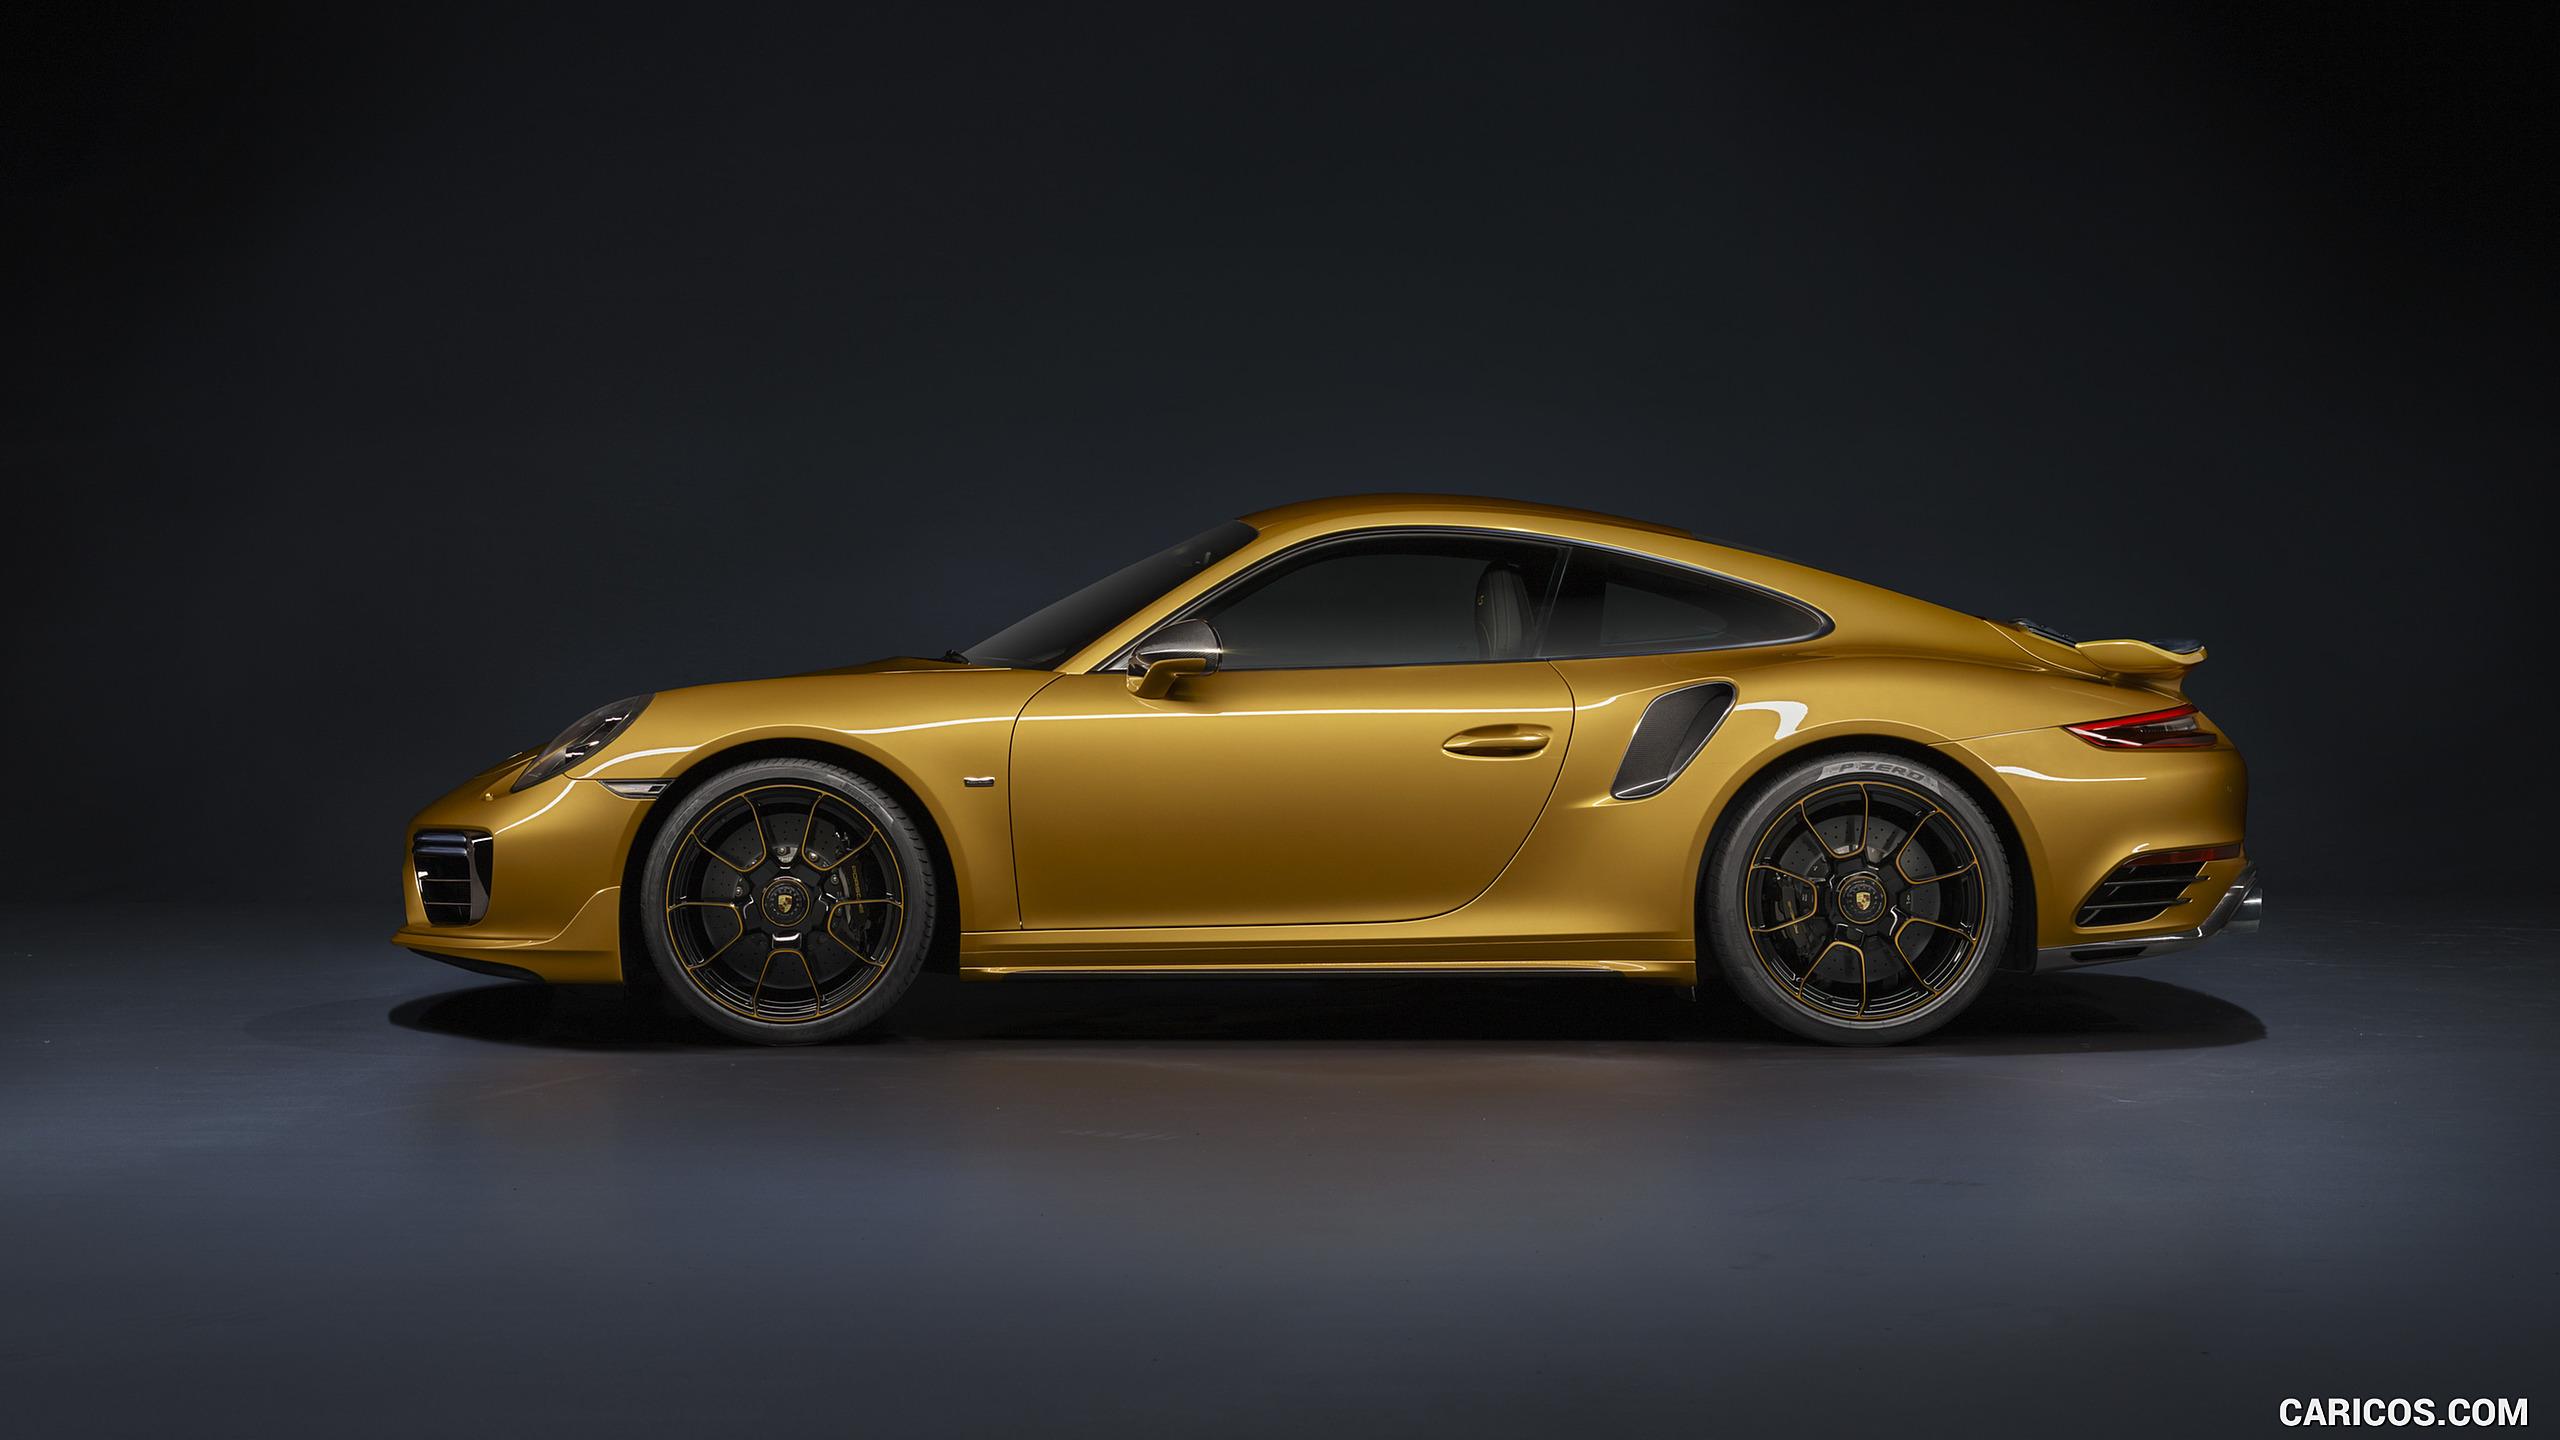 2018 Porsche 911 Turbo S Exclusive Series   Side HD Wallpaper 5 2560x1440